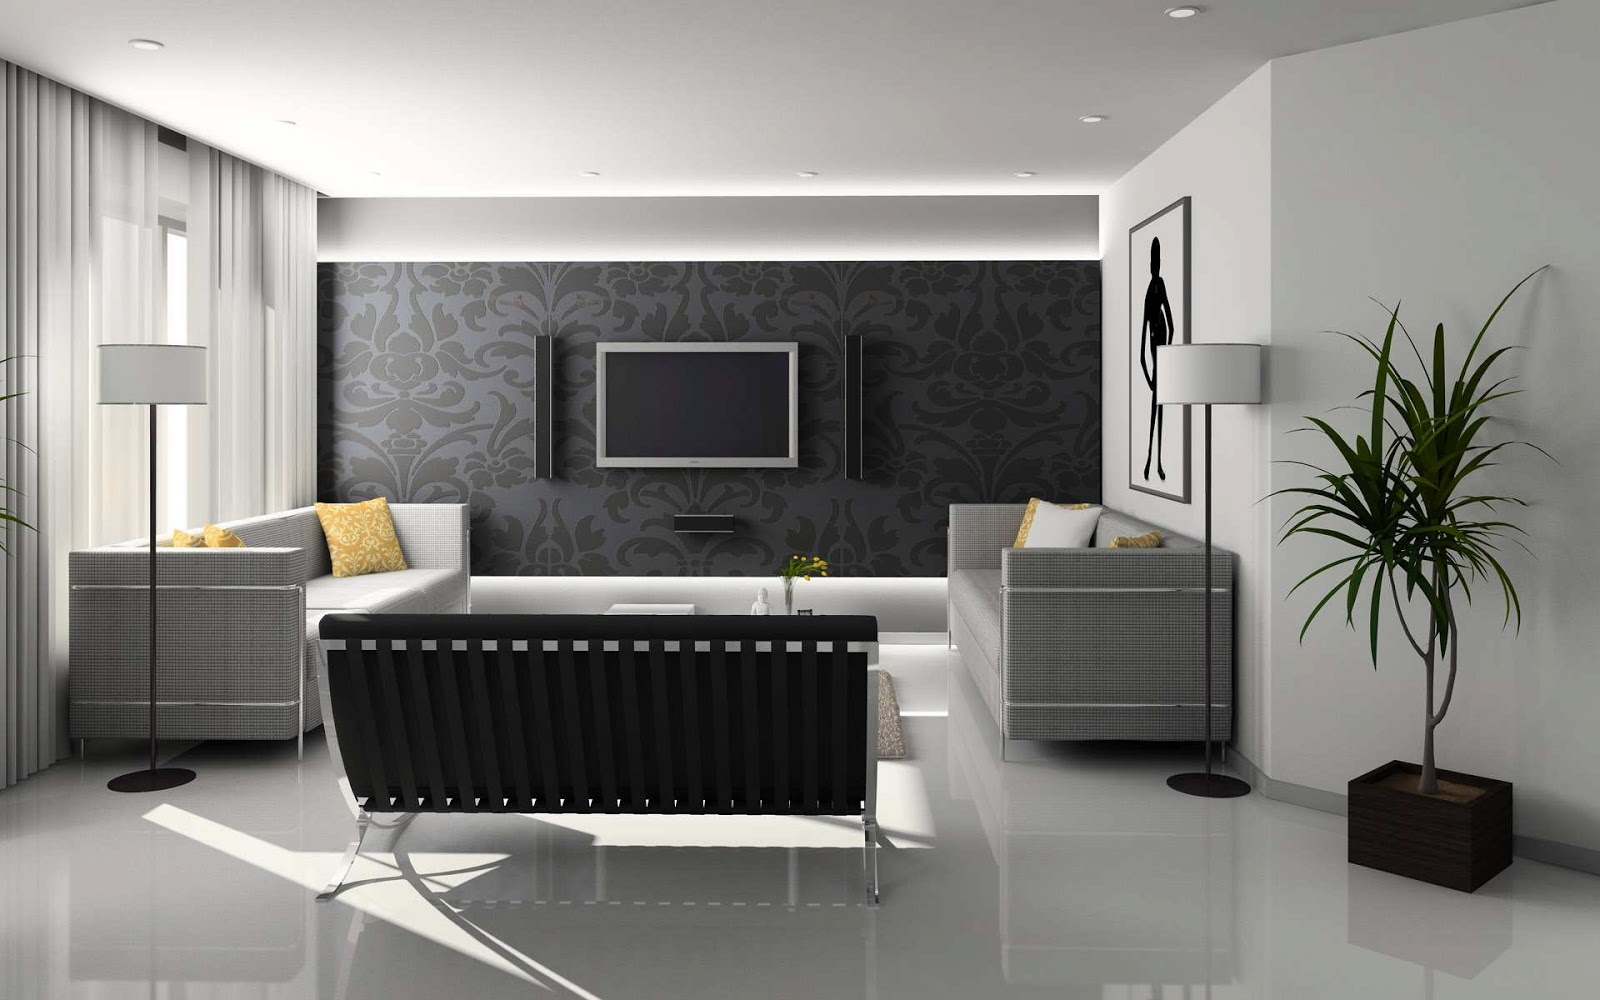 new home interior design ideas entrenoir.blo.com home interior design ideas3 white living room home interior design